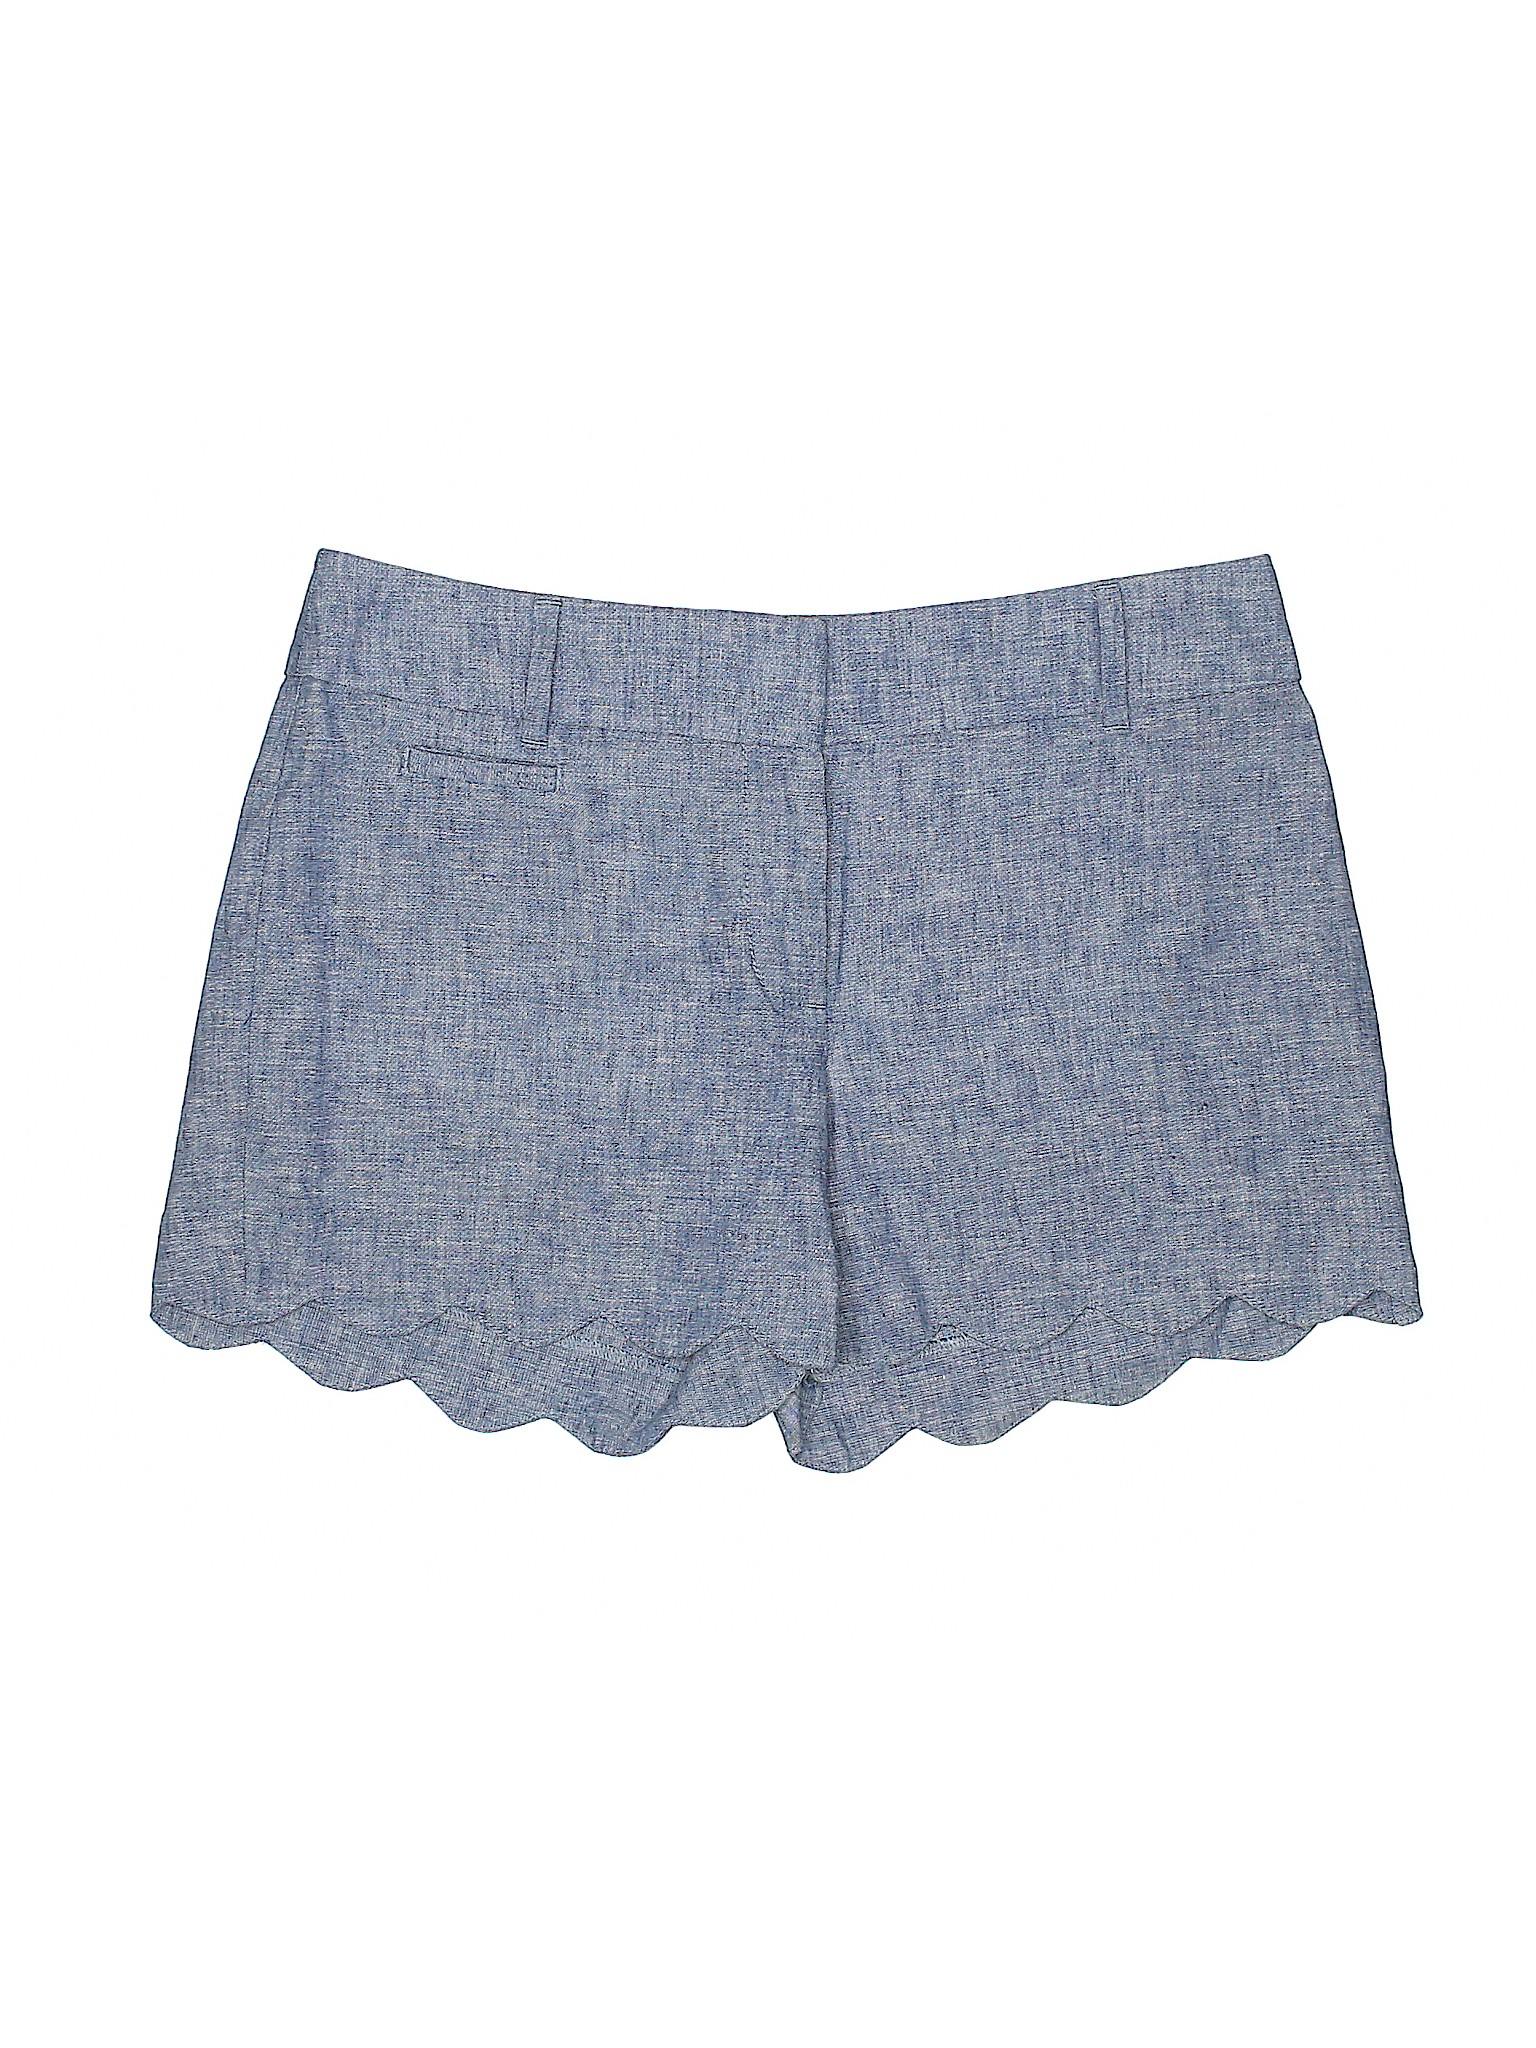 leisure LOFT Shorts Khaki Boutique Ann Taylor nd7A6x40q